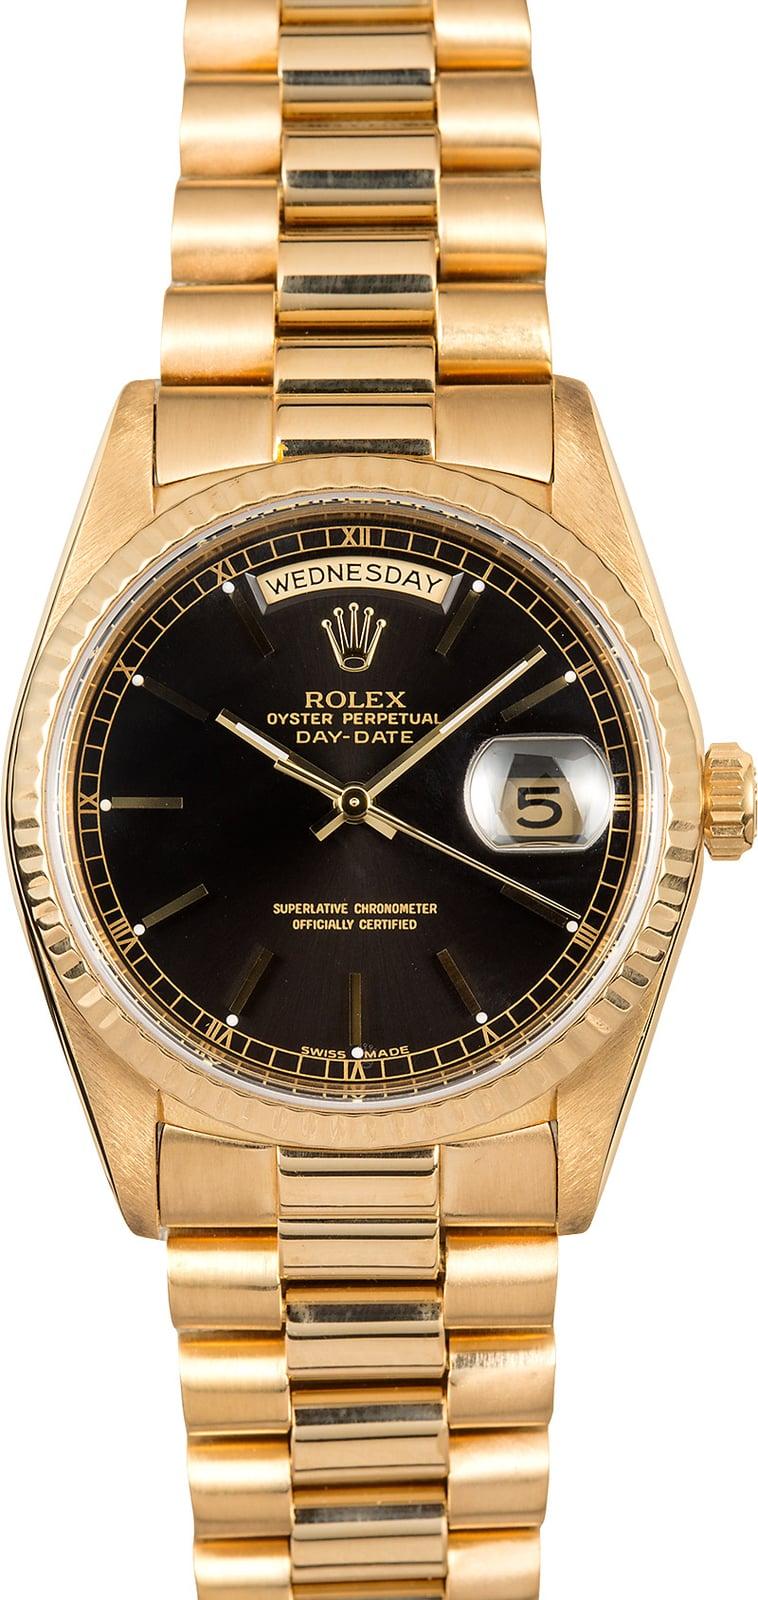 Rolex presidential day date in Melbourne